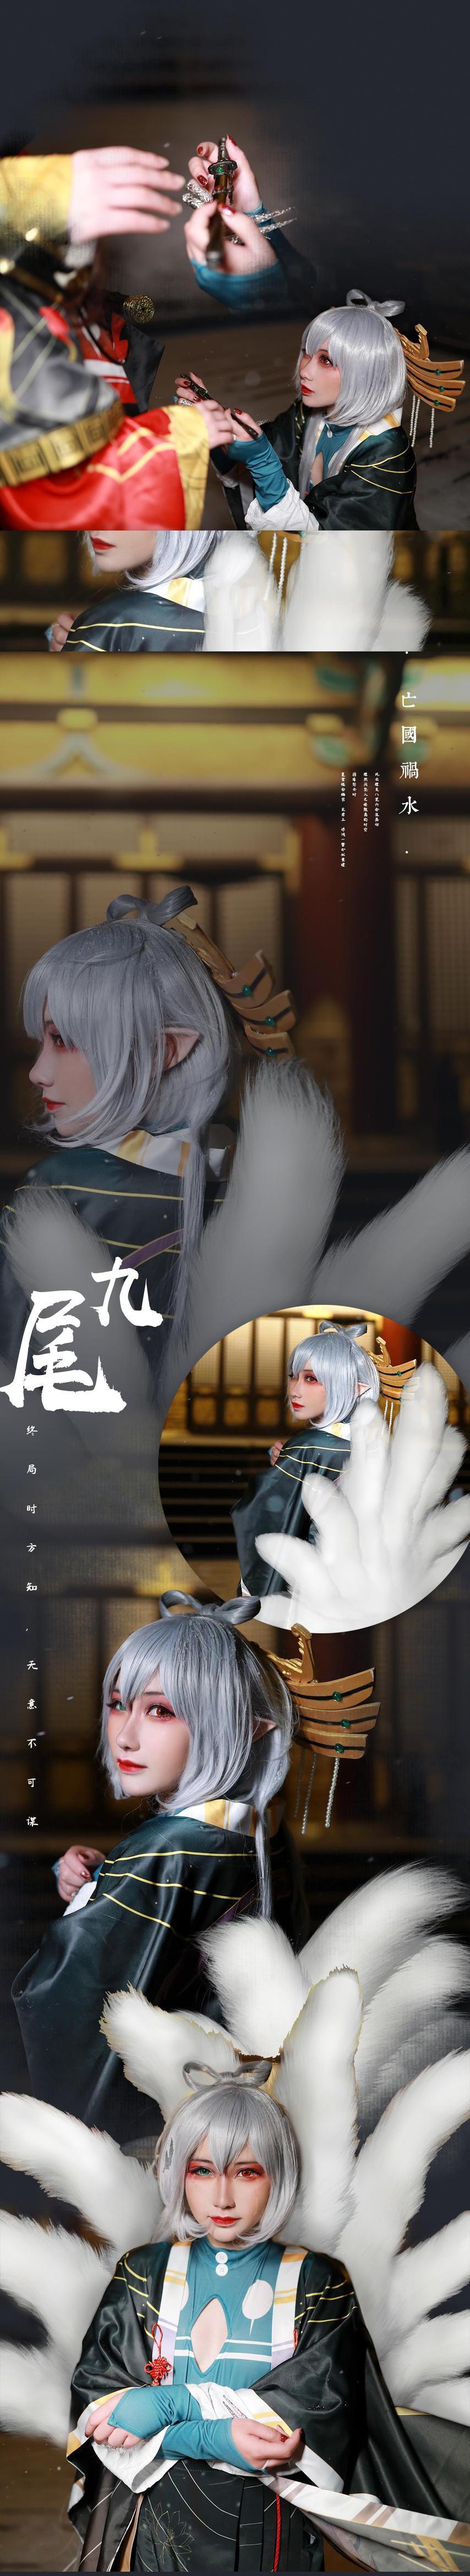 《VOCALOID》正片cosplay【CN:时雨-Jiu】-第8张